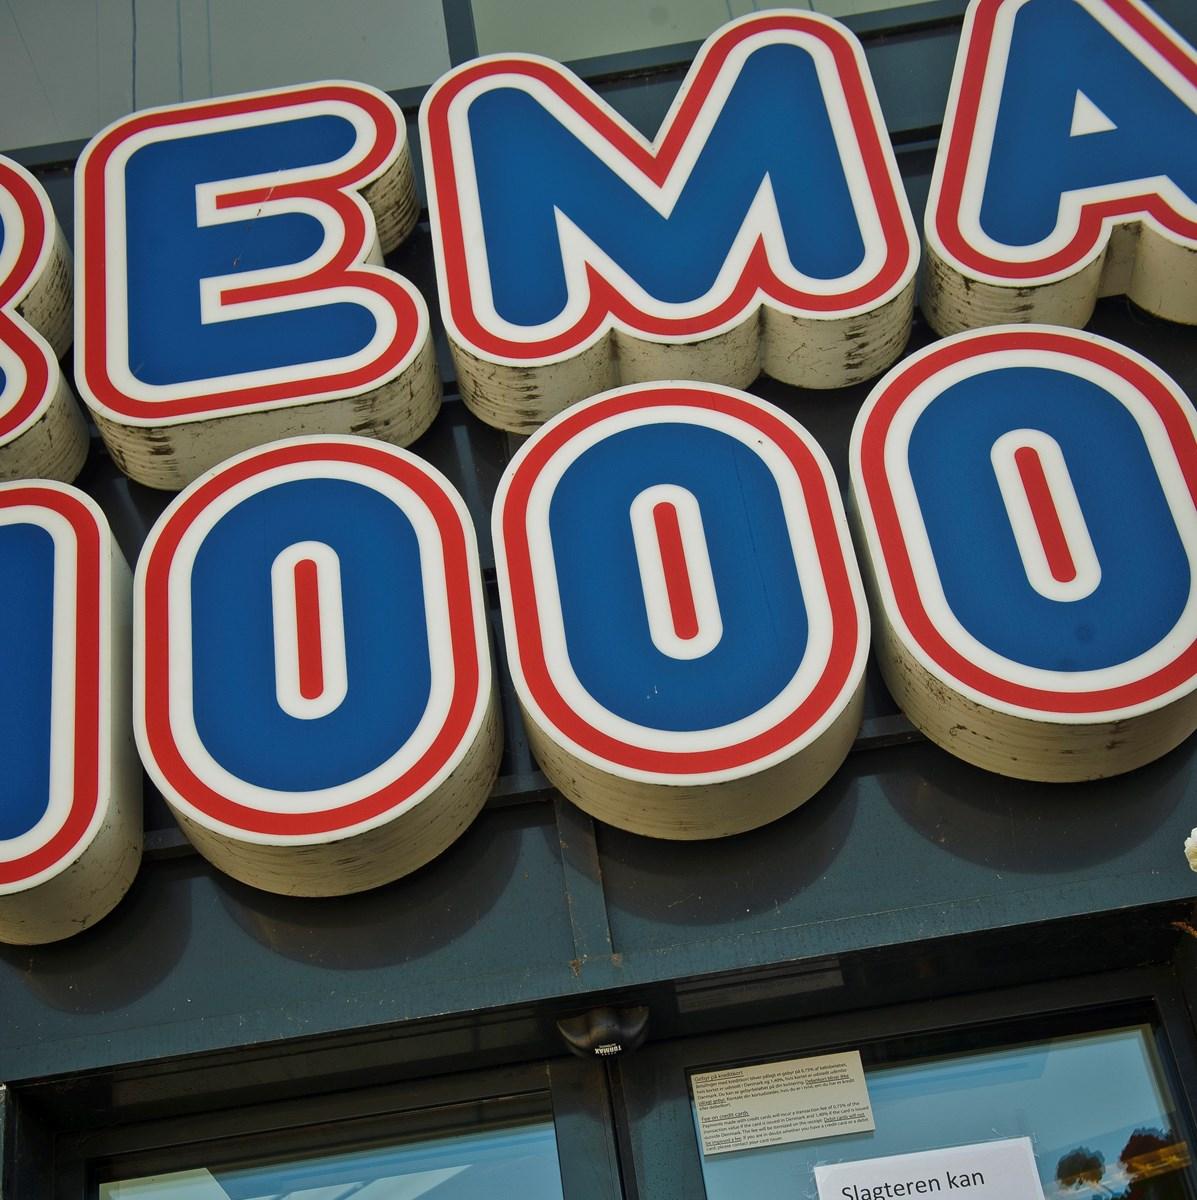 Efter skadedyr: Rema 1000 åbner igen